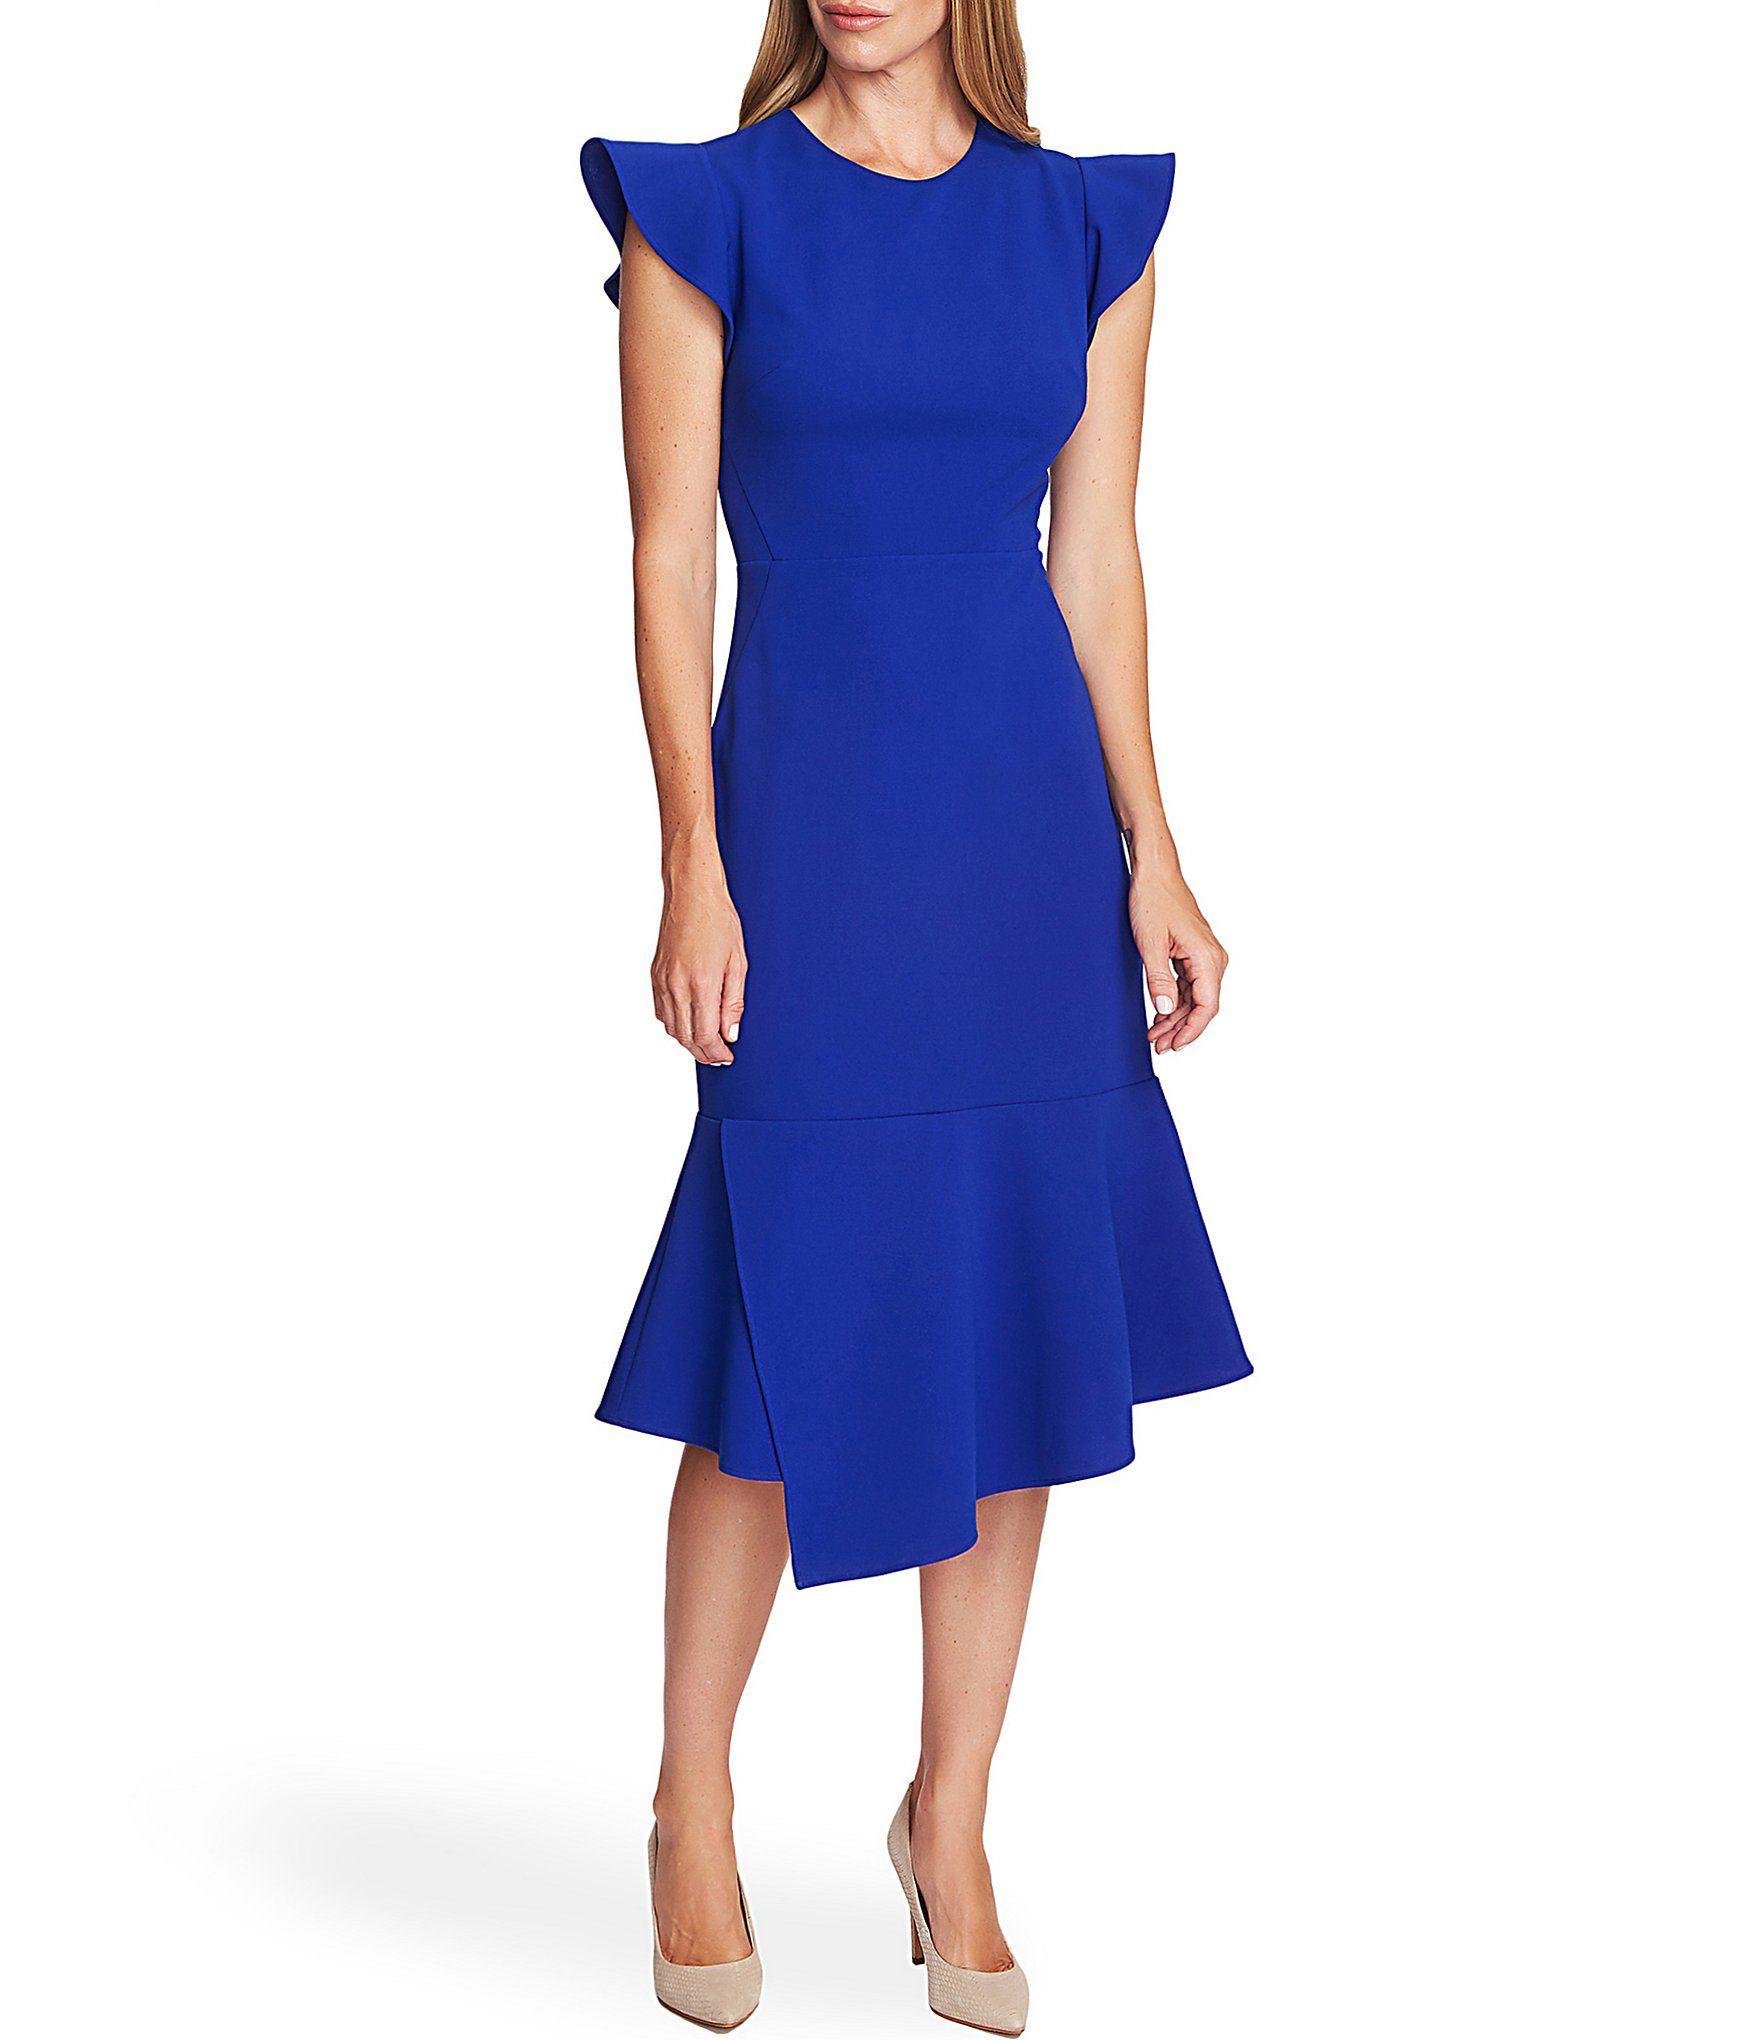 Vince Camuto Flutter Sleeve Asymmetrical Peplum Midi Dress Dillards Peplum Midi Dress Womens Midi Dresses Electric Blue Dresses [ 2040 x 1760 Pixel ]